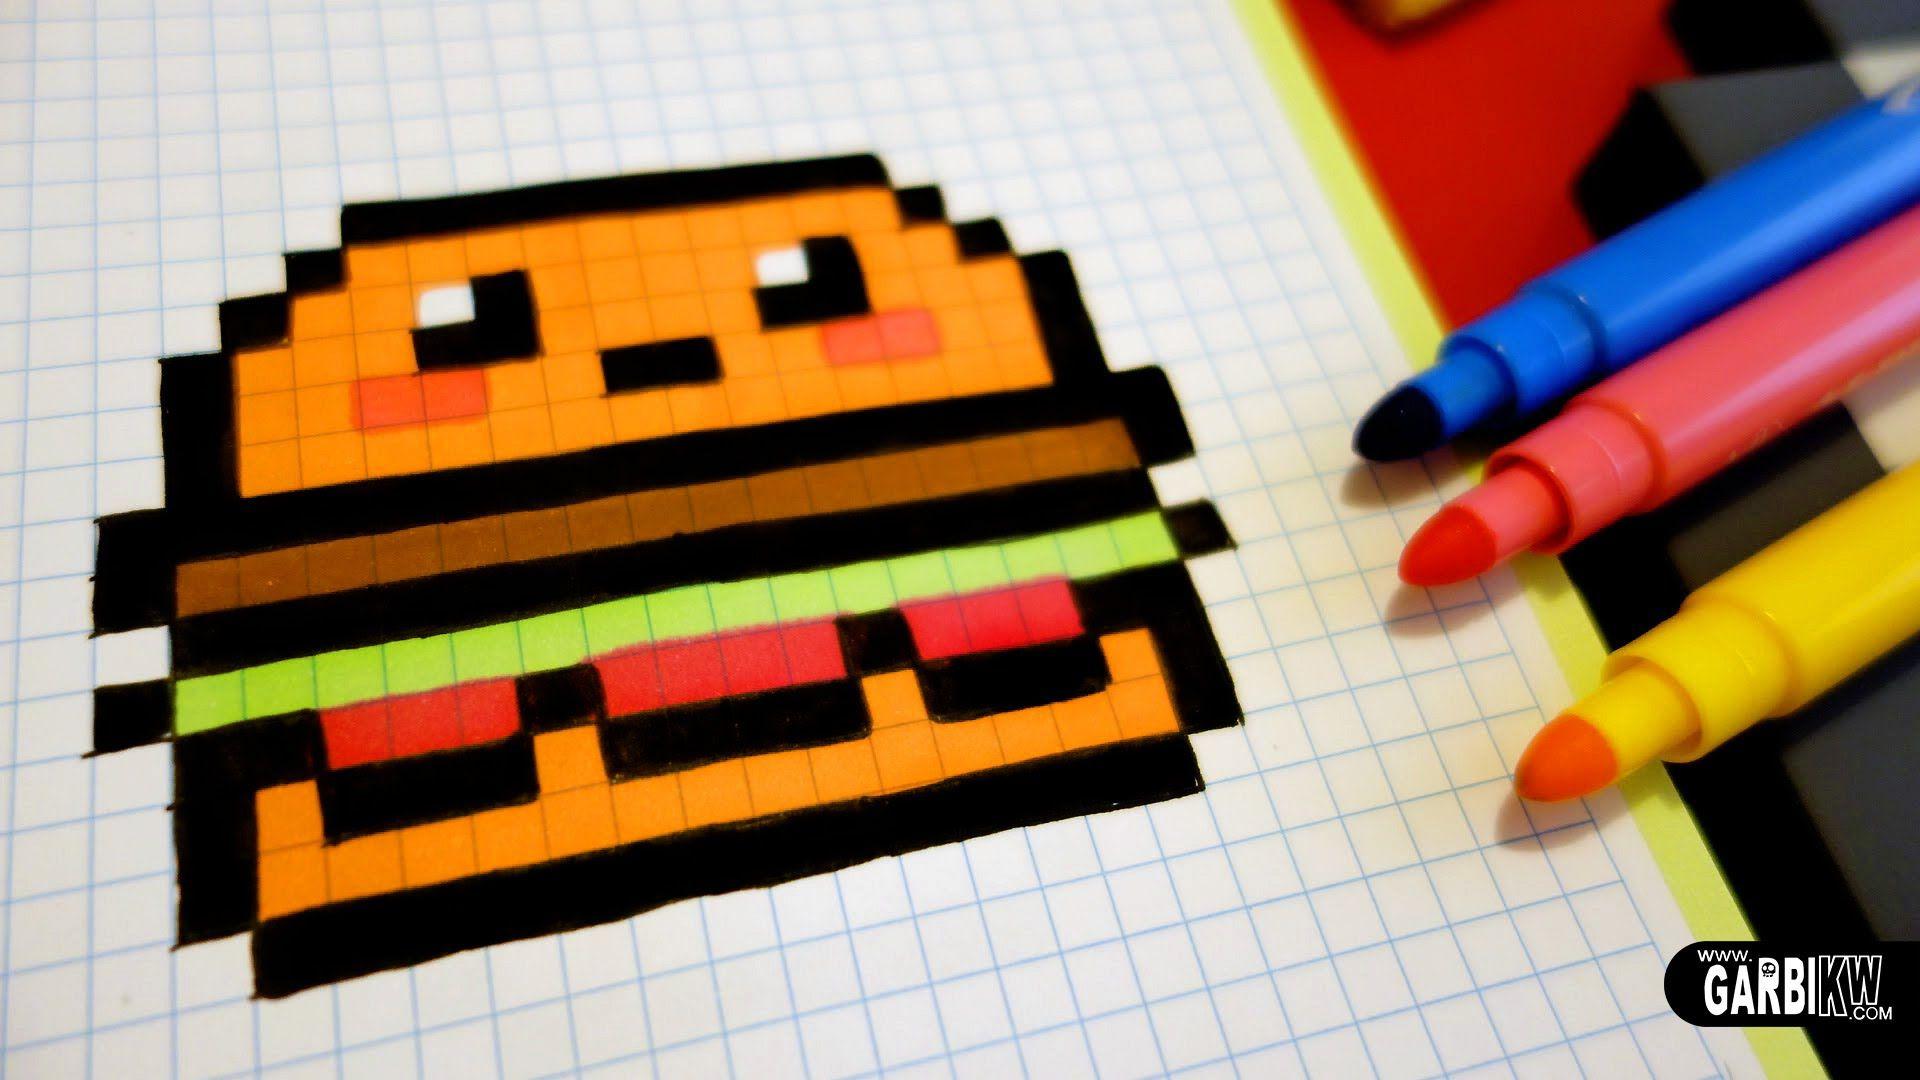 Handmade Pixel Art - How To Draw Kawaii Hamburger #pixelart concernant Modele Dessin Pixel